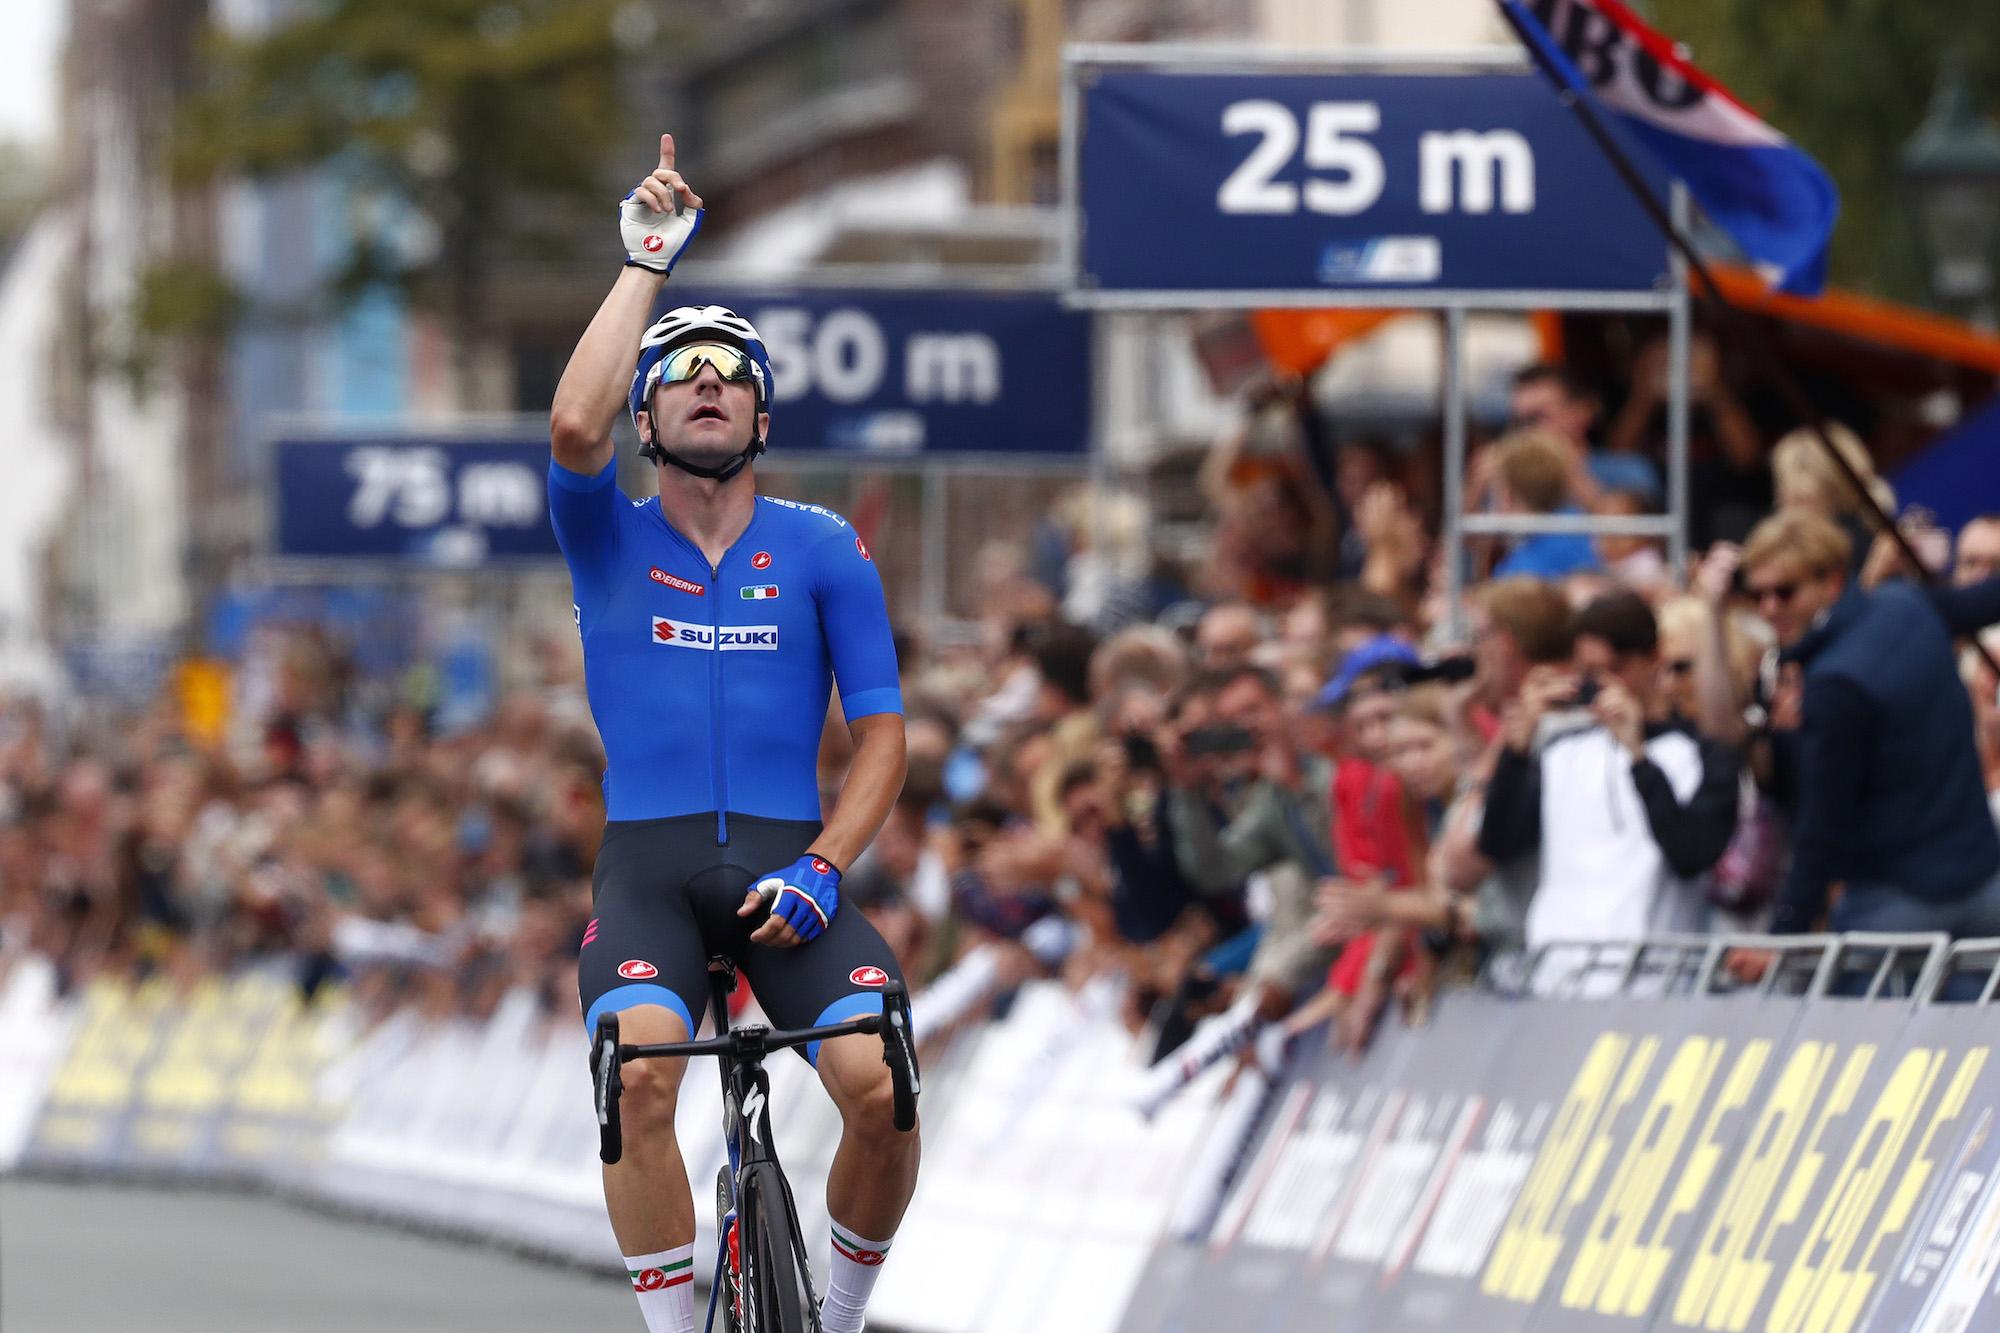 Elia Viviani Beats Yves Lampaert To Take European